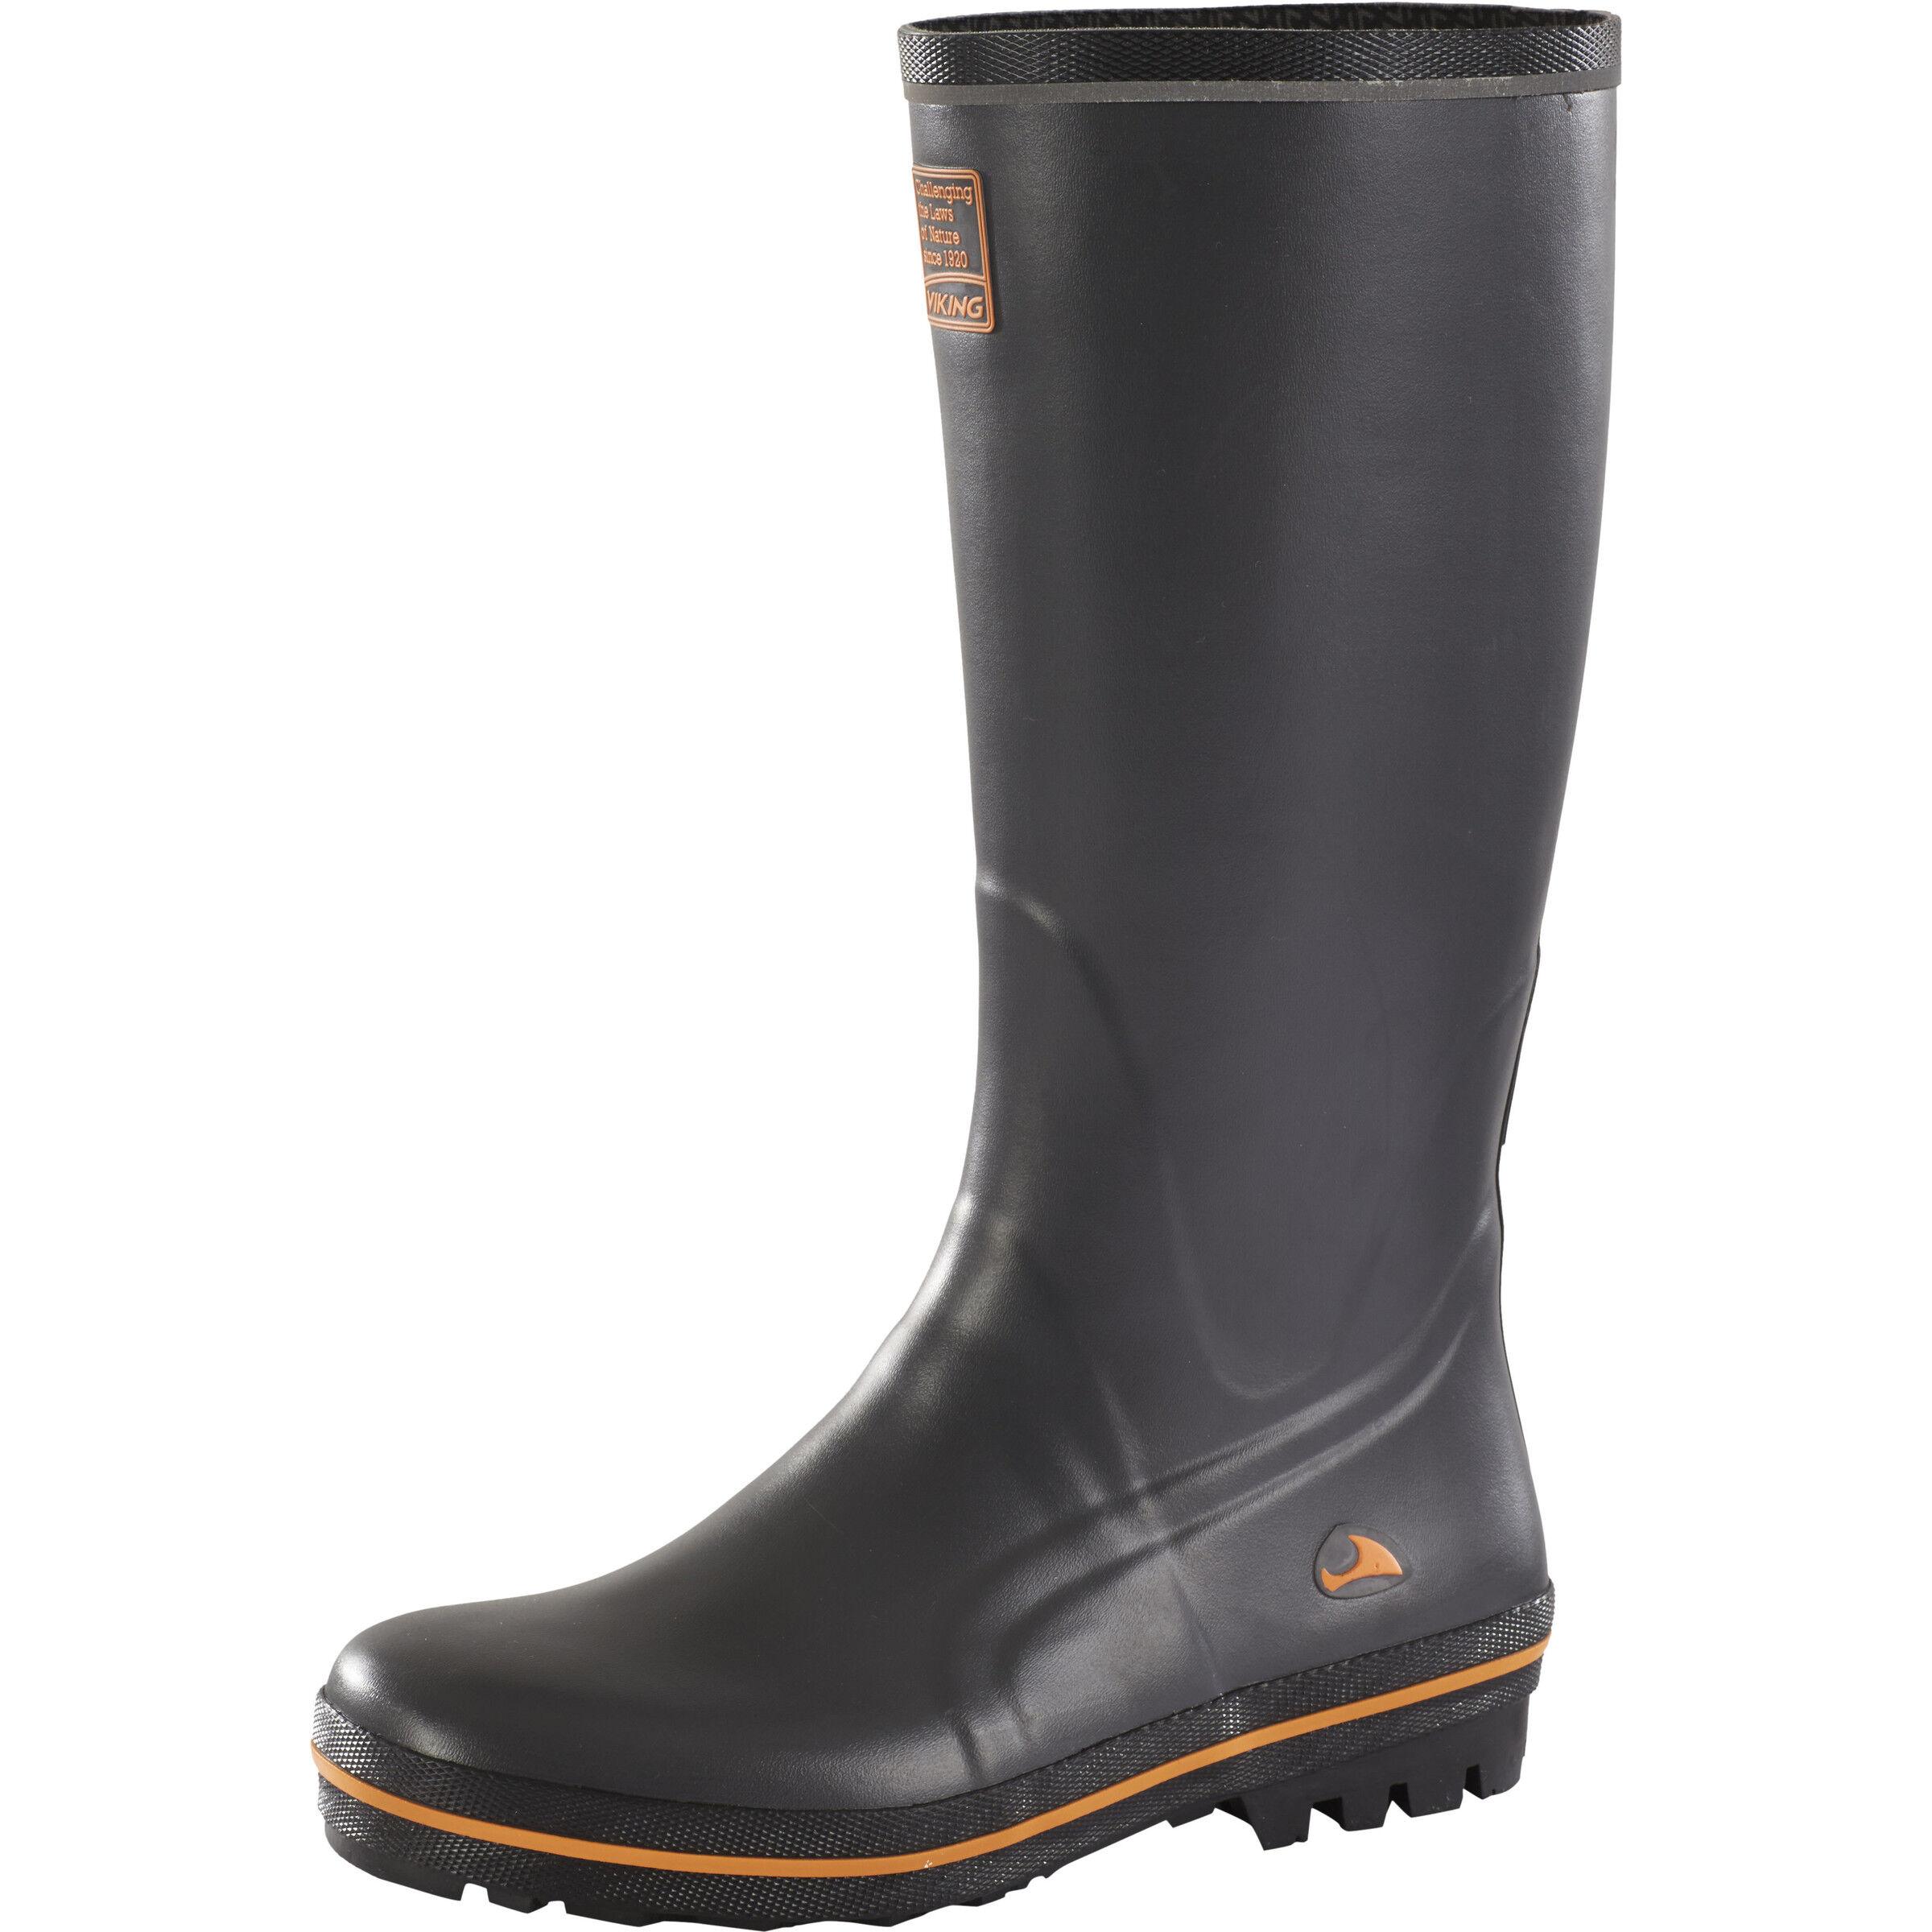 Viking Charcoalmulti Boots Footwear Boots Tracker Tracker Charcoalmulti Viking Footwear Tracker Footwear Viking Y76mfybgvI